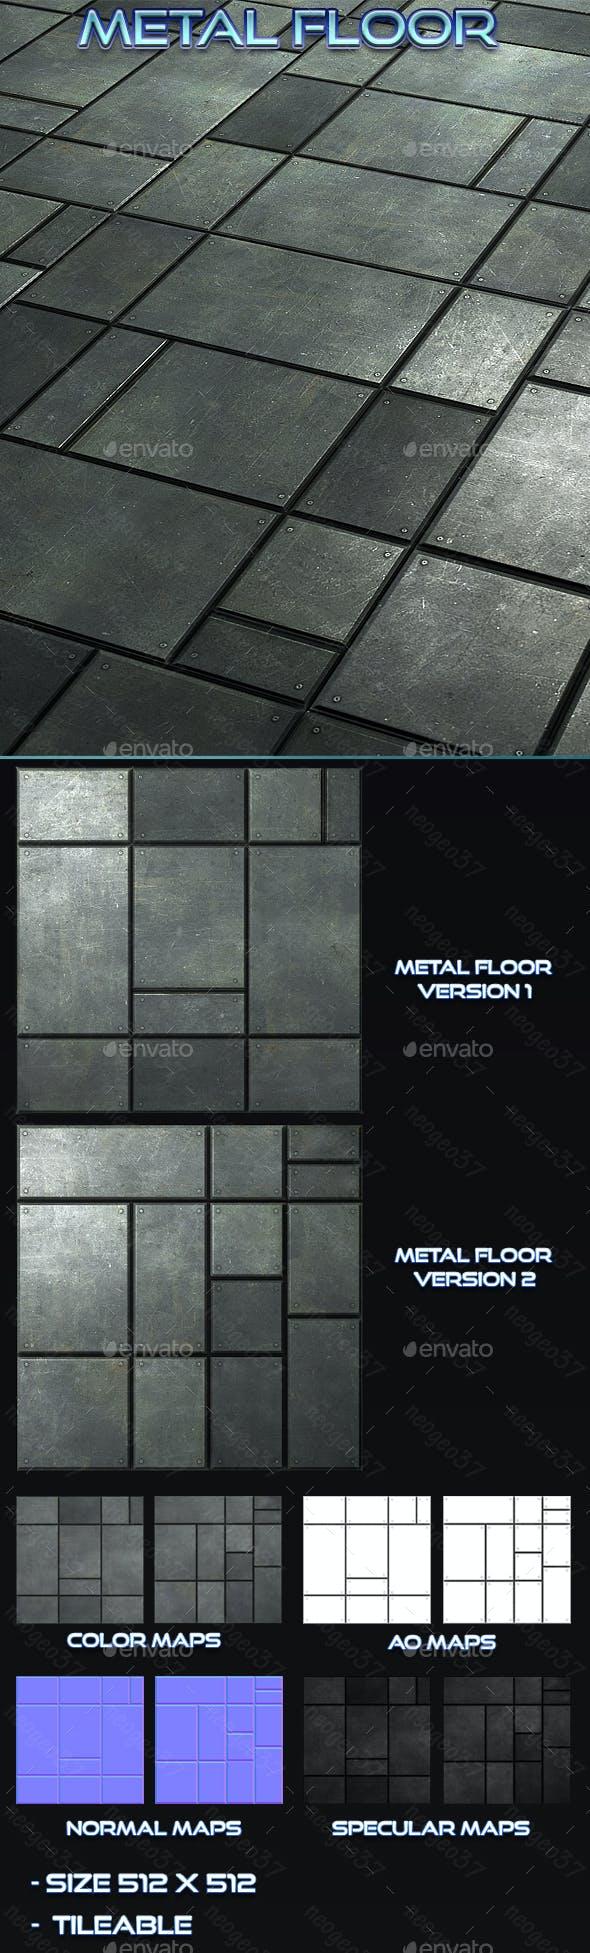 Metal Floor Title - 3DOcean Item for Sale